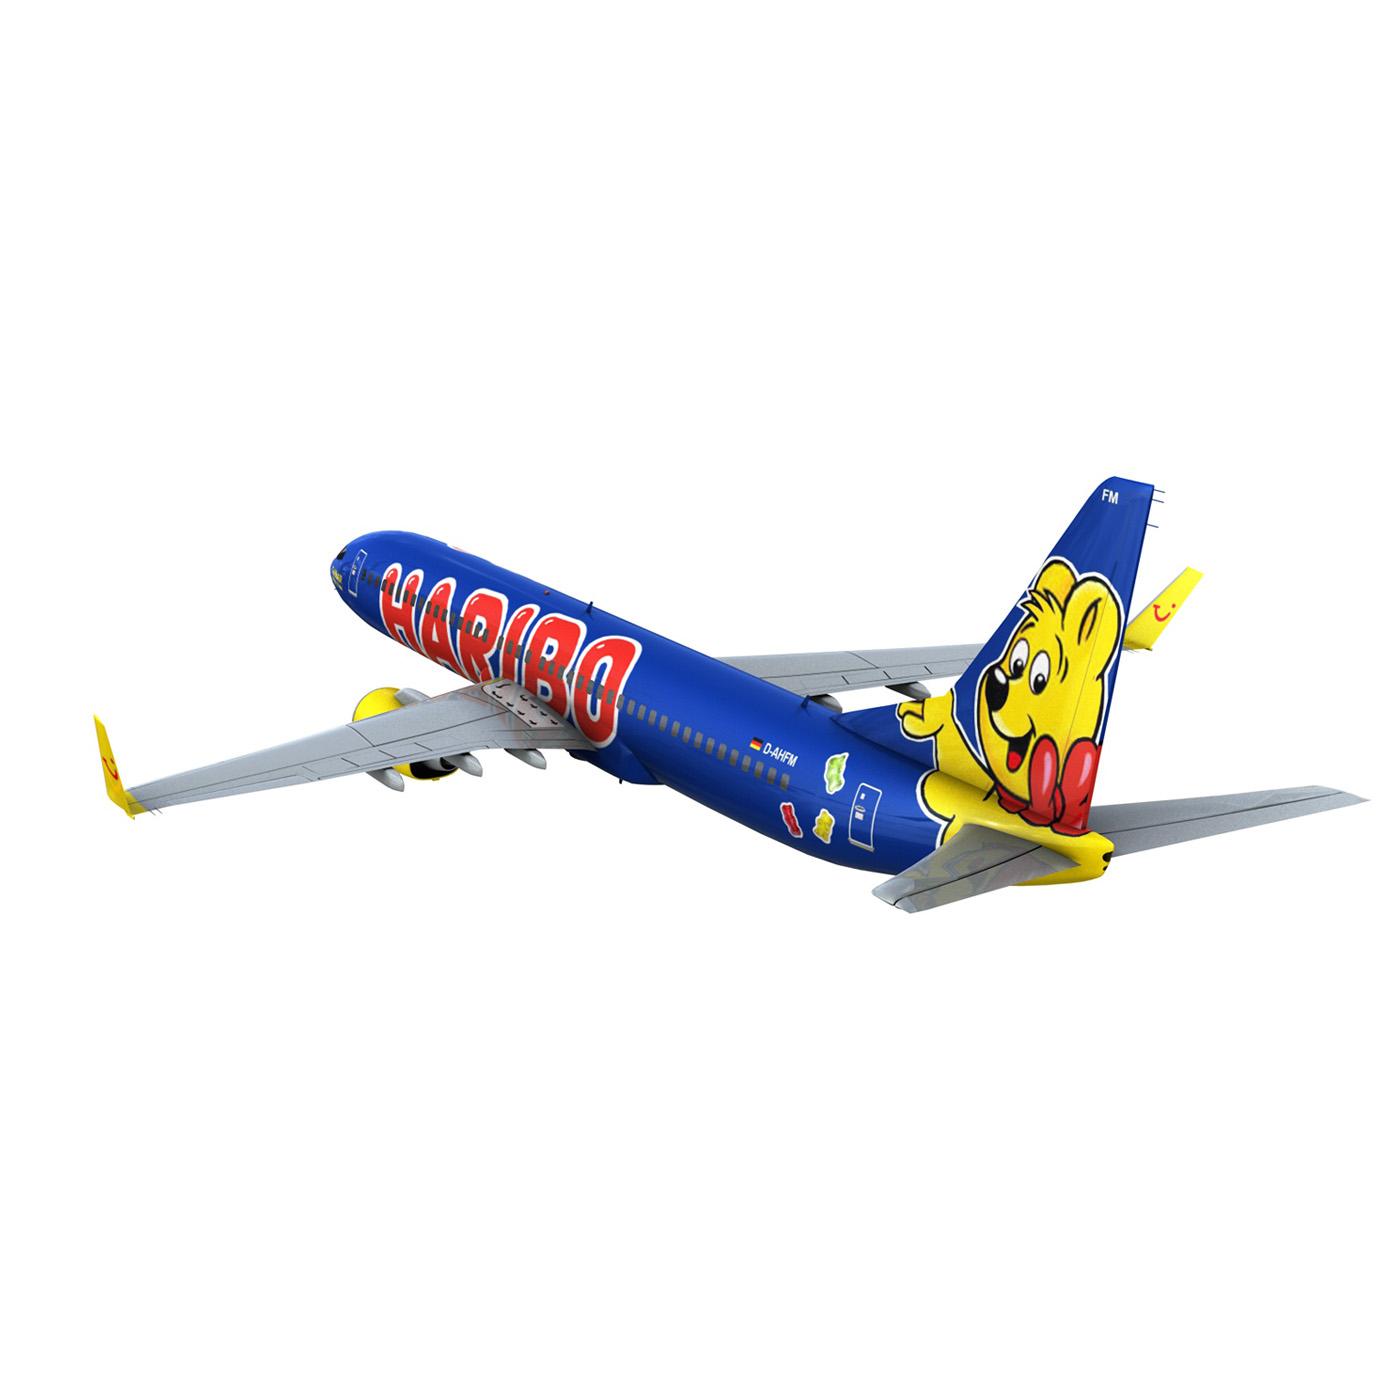 boeing 737-800 goldbair 3d model 3ds fbx c4d lwo obj 293502